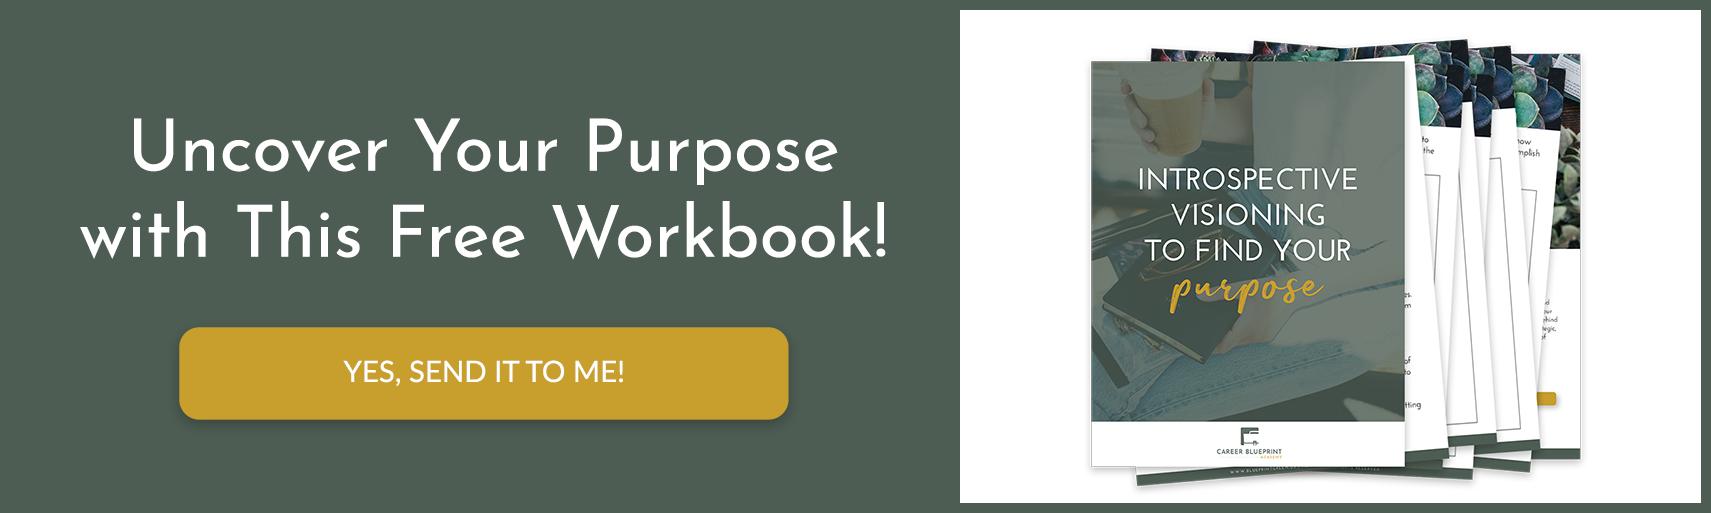 Introspective-Workbook-Optin.png